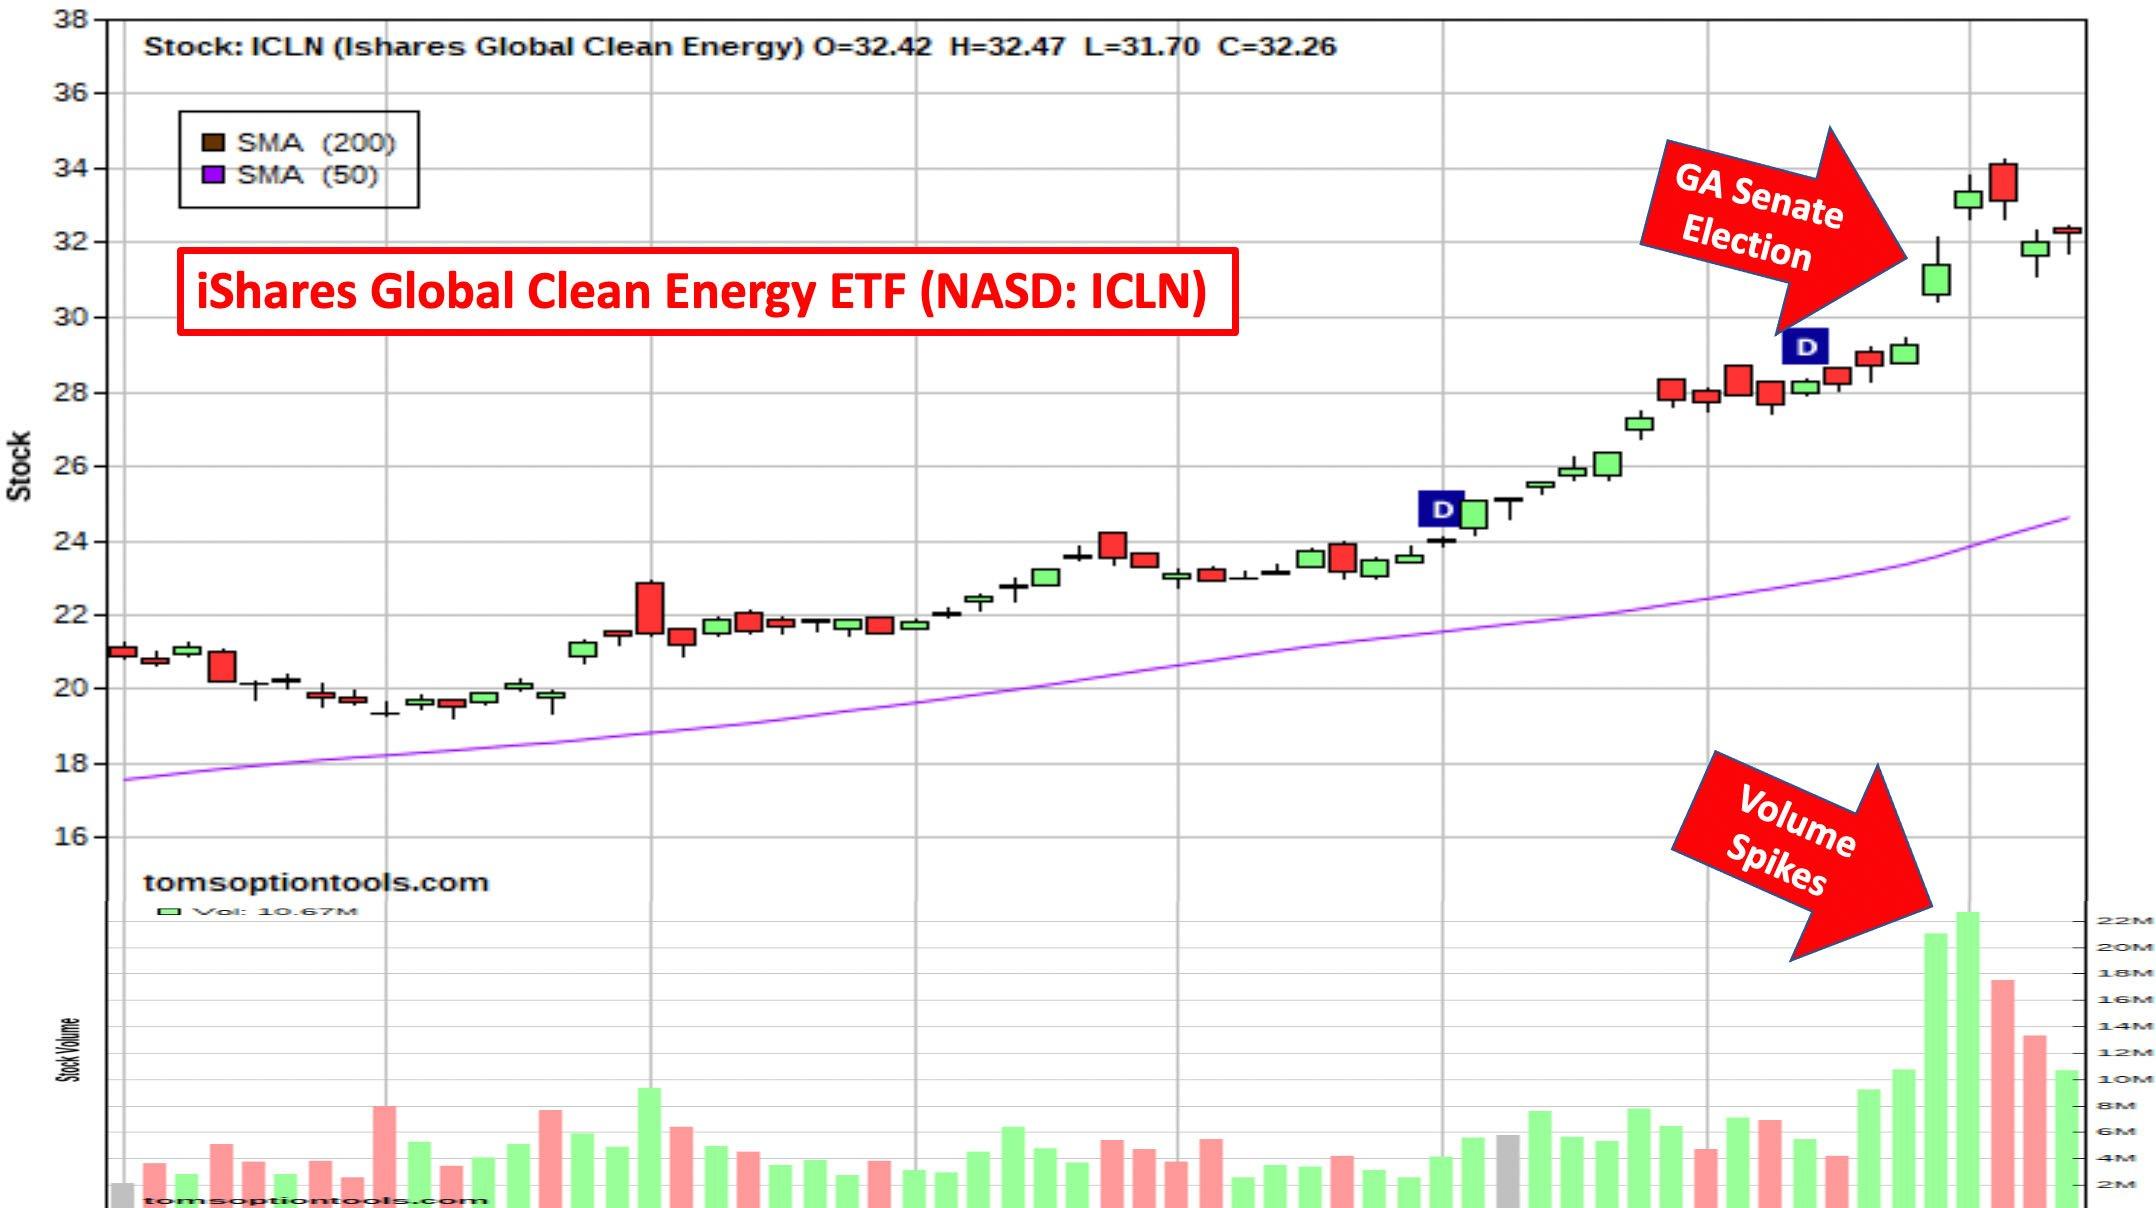 Green energy stock increase